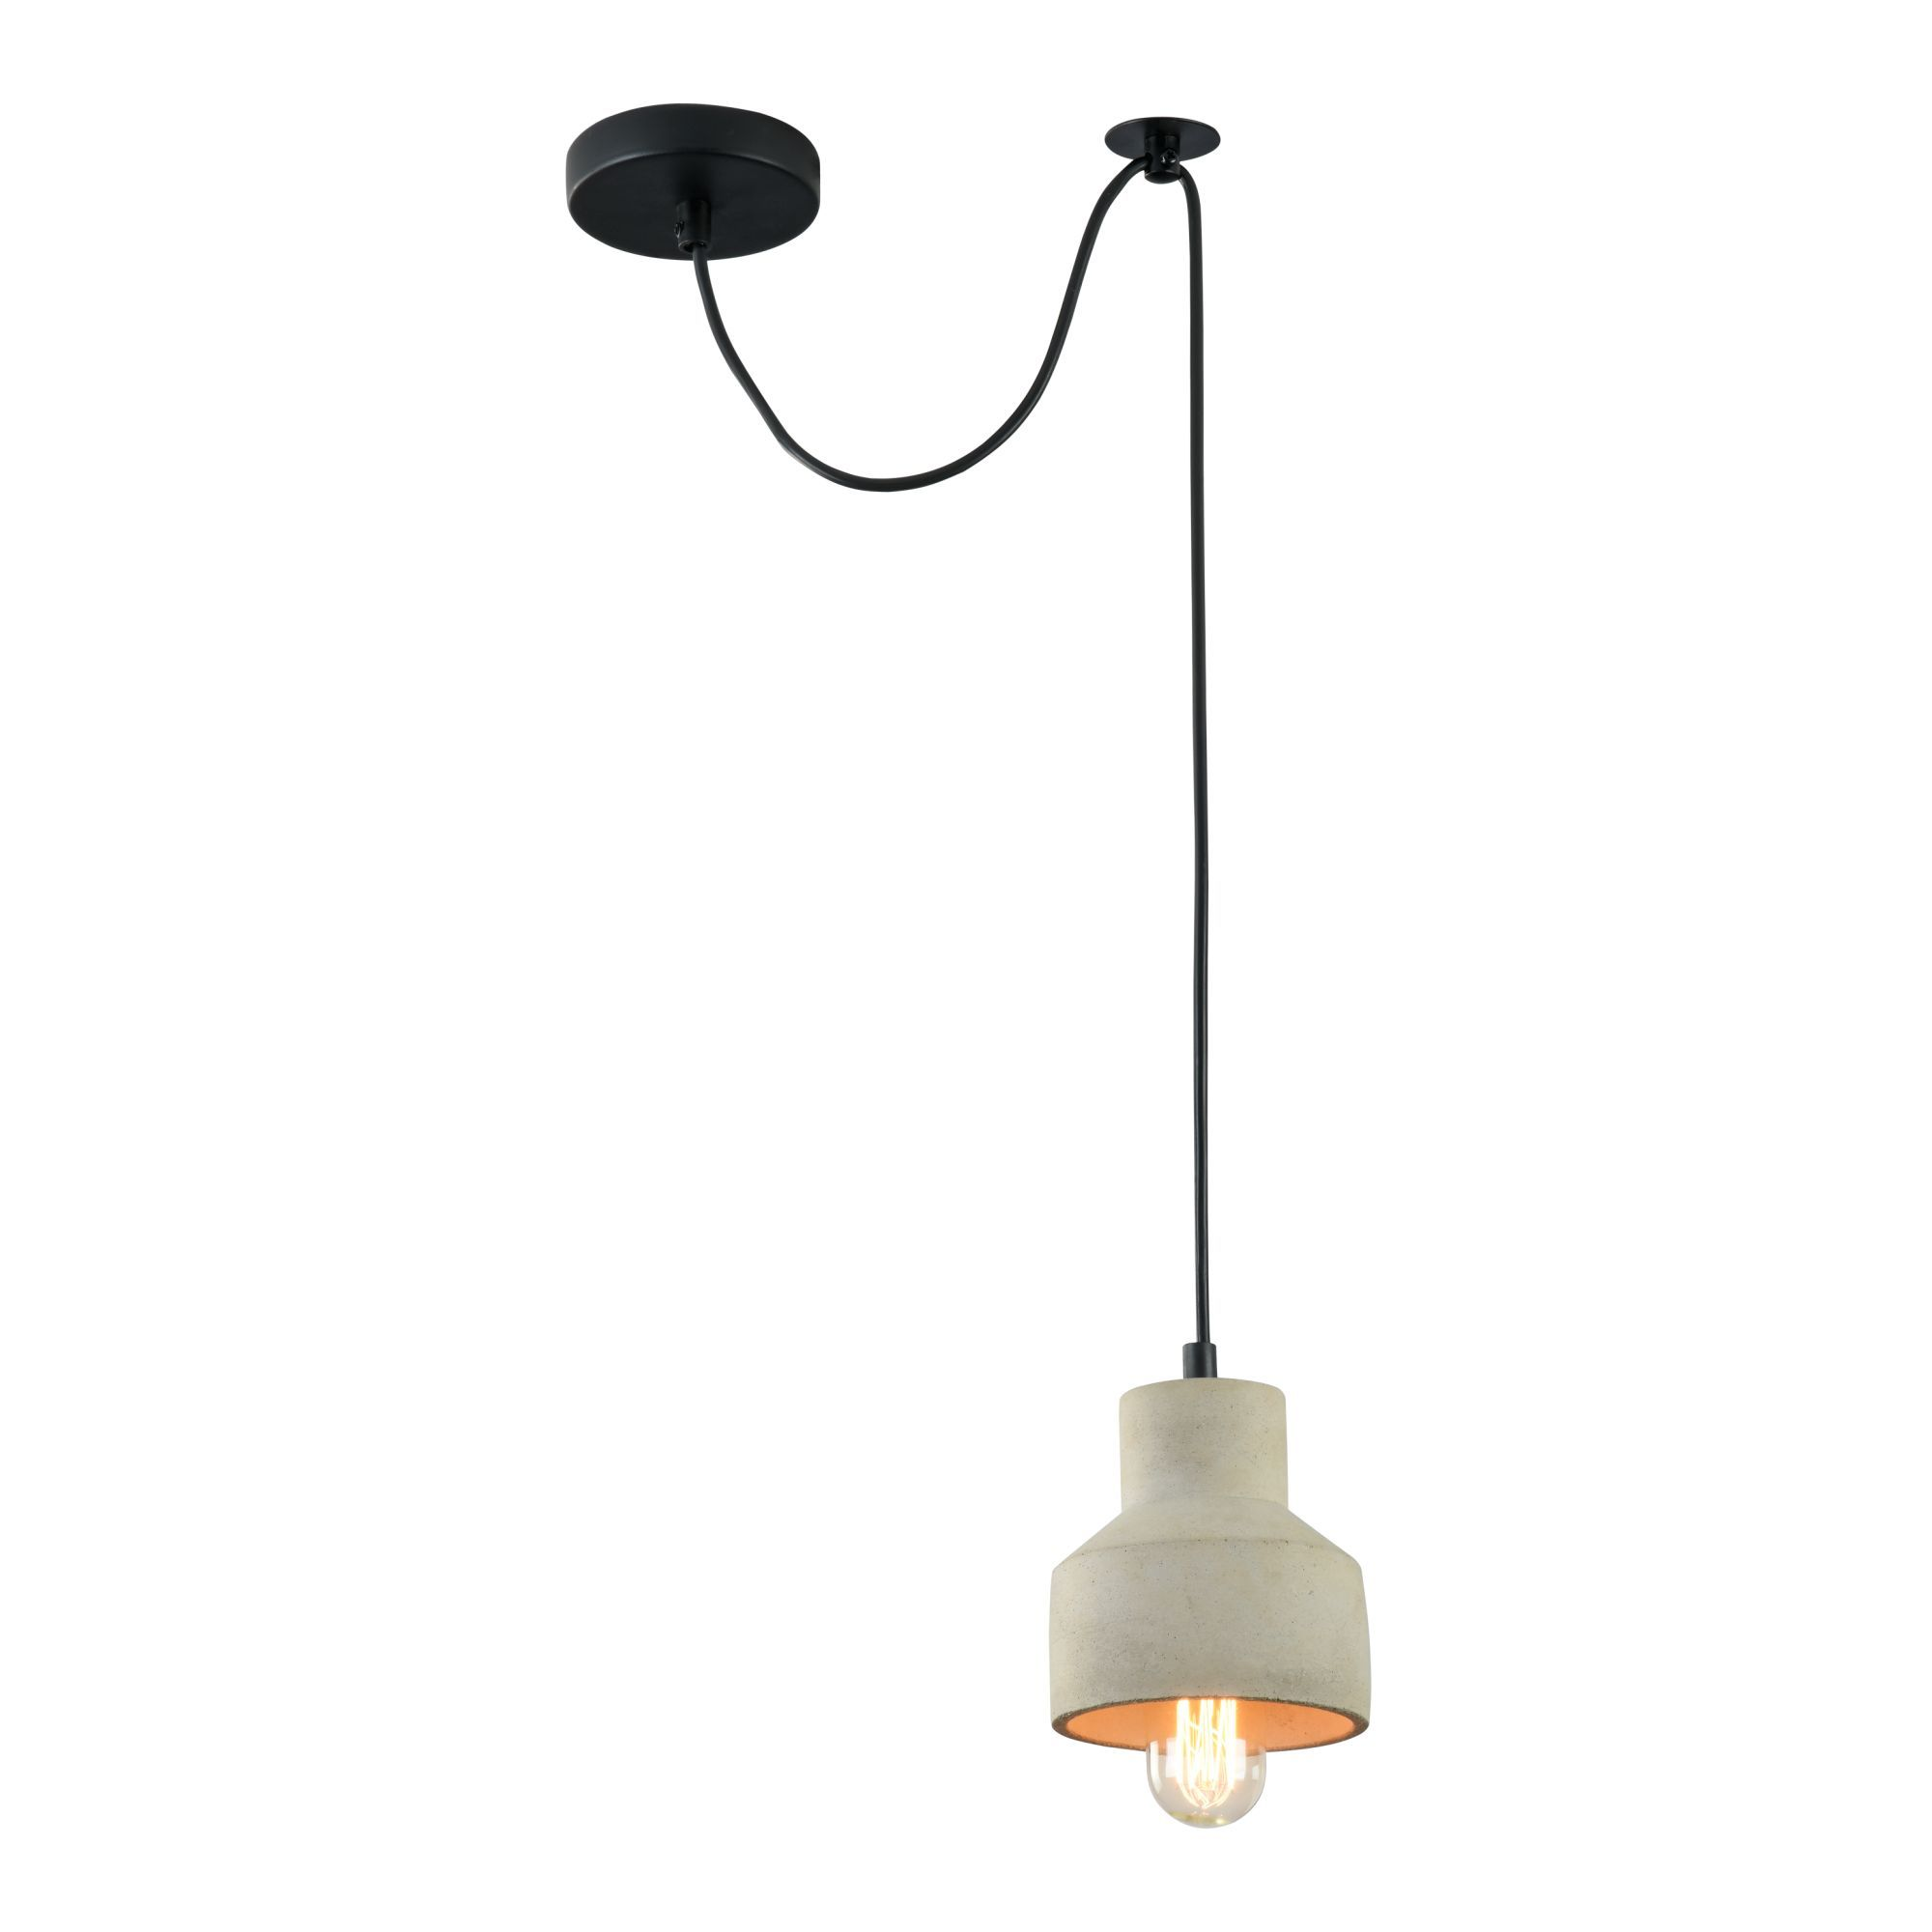 Подвесной светильник Maytoni Broni T437-PL-01-GR, 1xE27x60W, черный, серый, металл, бетон - фото 1